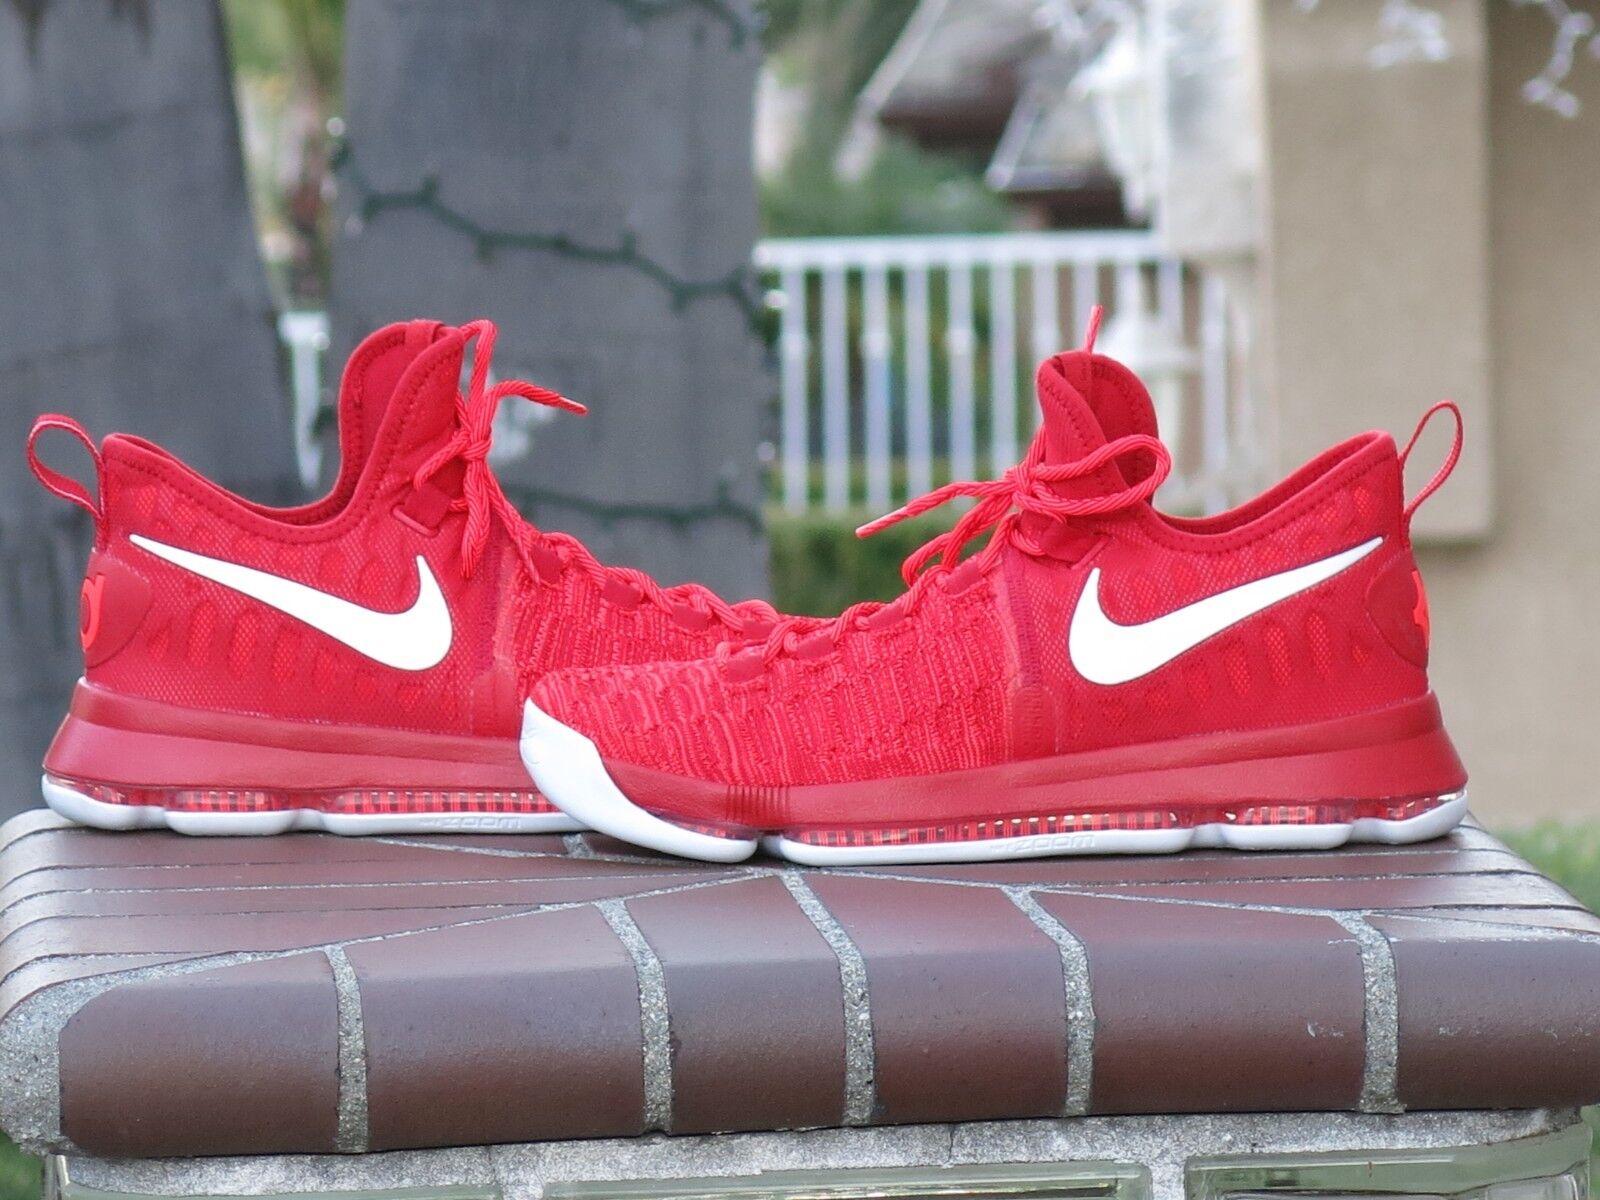 cheap for discount 9178e addfe ... Nike KD 9 IX Men s Men s Men s Basketball Sneakers 843392-611 6ff44f ...